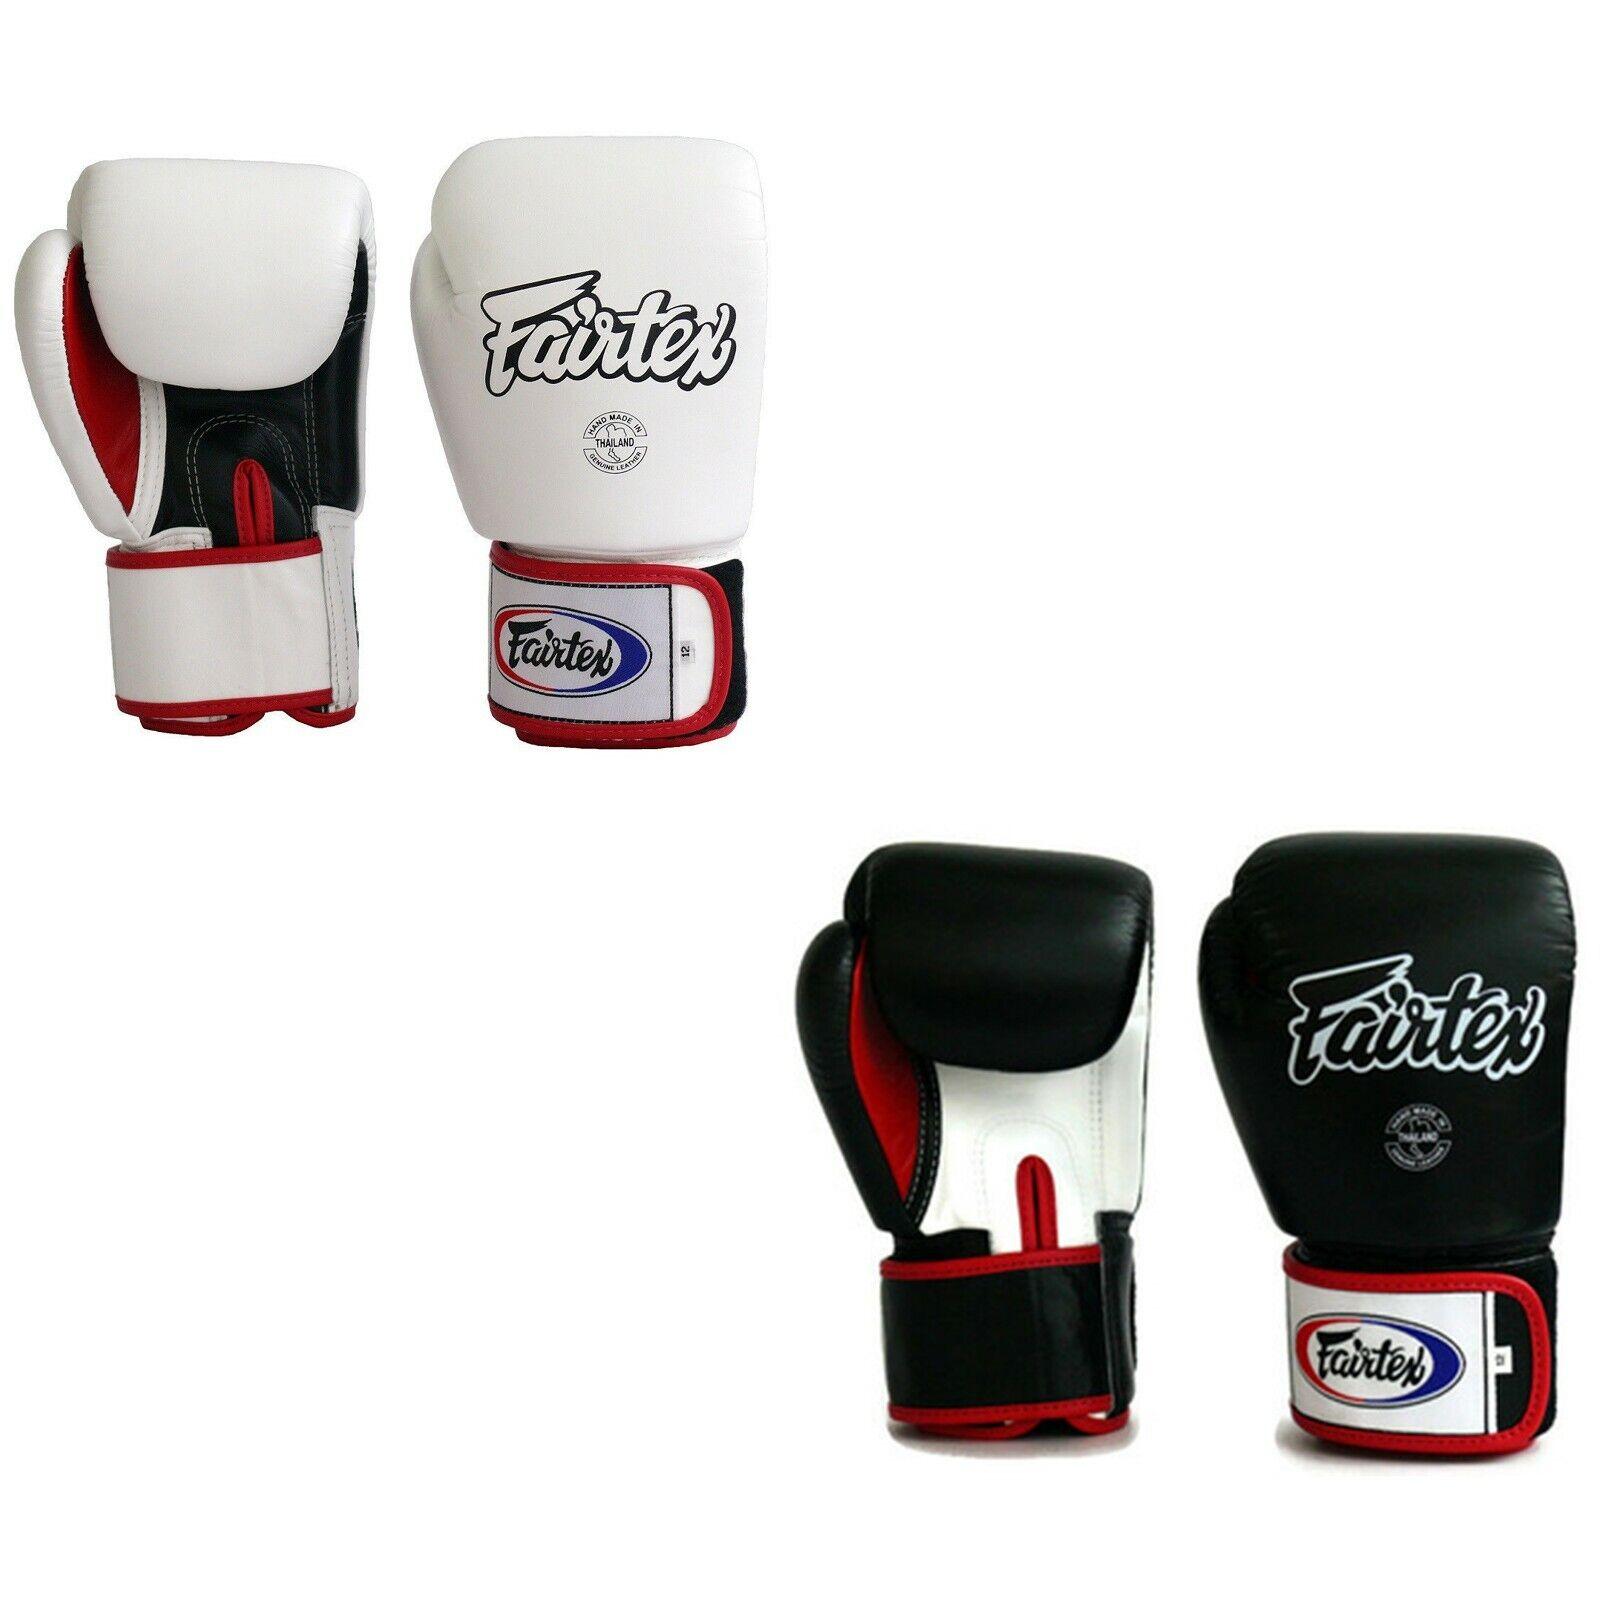 Fairtex BGV1 3T color Sporting Training MMA Martial Arts Muay  Thai Boxing G s  lightning delivery